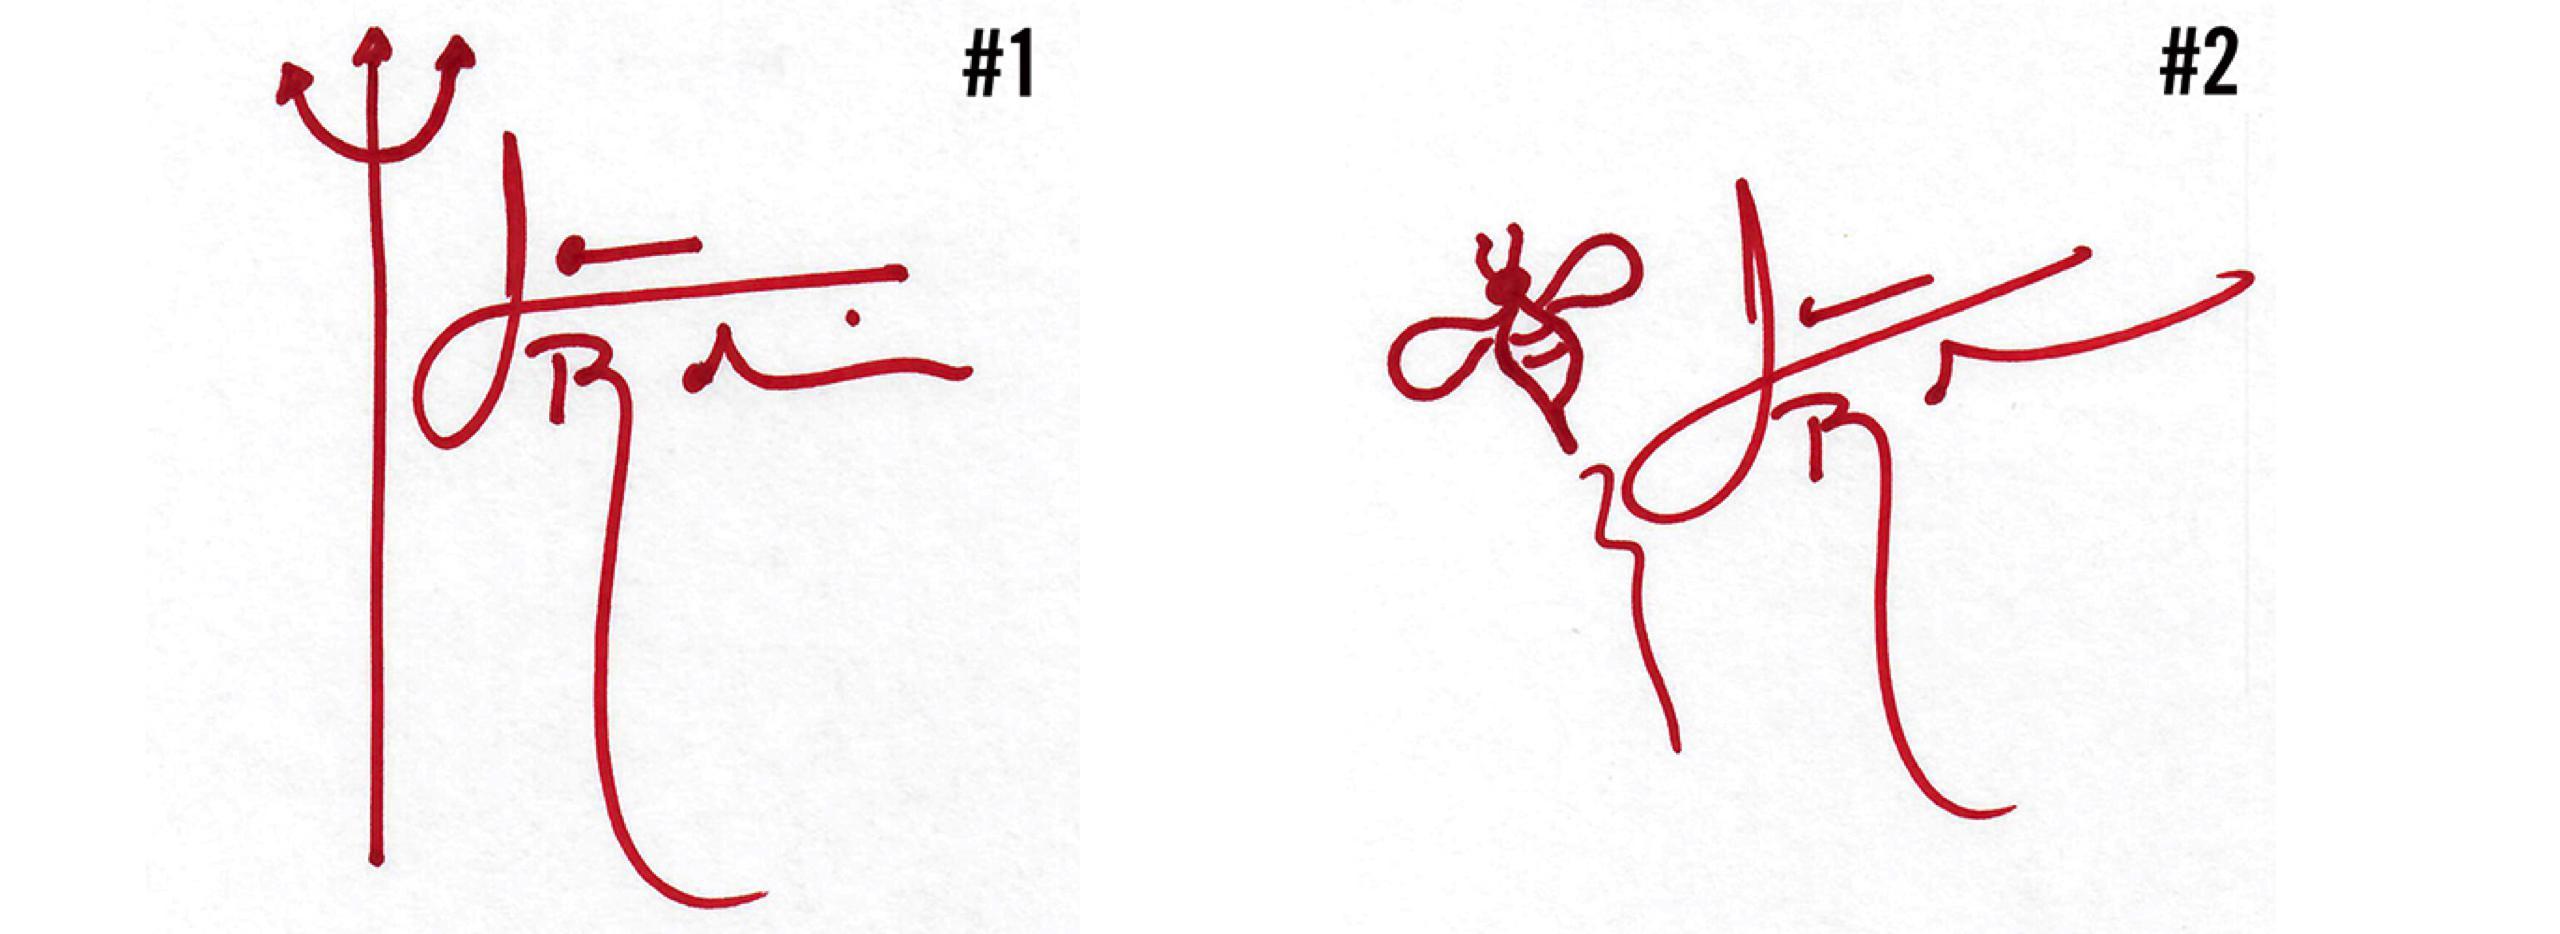 James Rollins The Demon Crown: A Sigma Force Novel Signing Doodle News